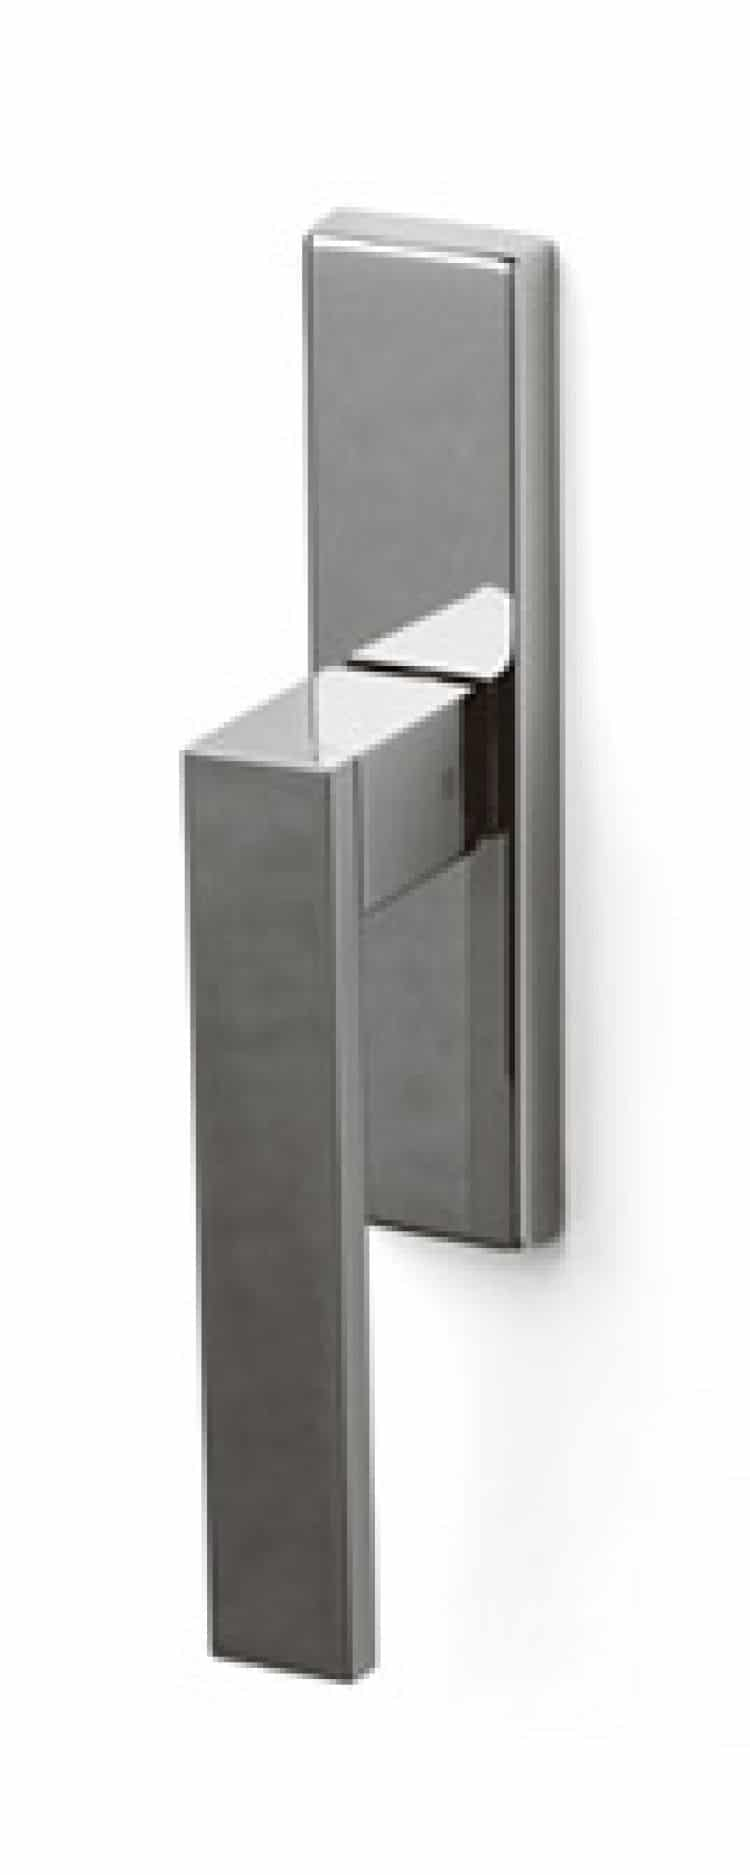 Maniglia design olivari diana maniglia per finestra cremonese - Maniglie per finestre olivari ...